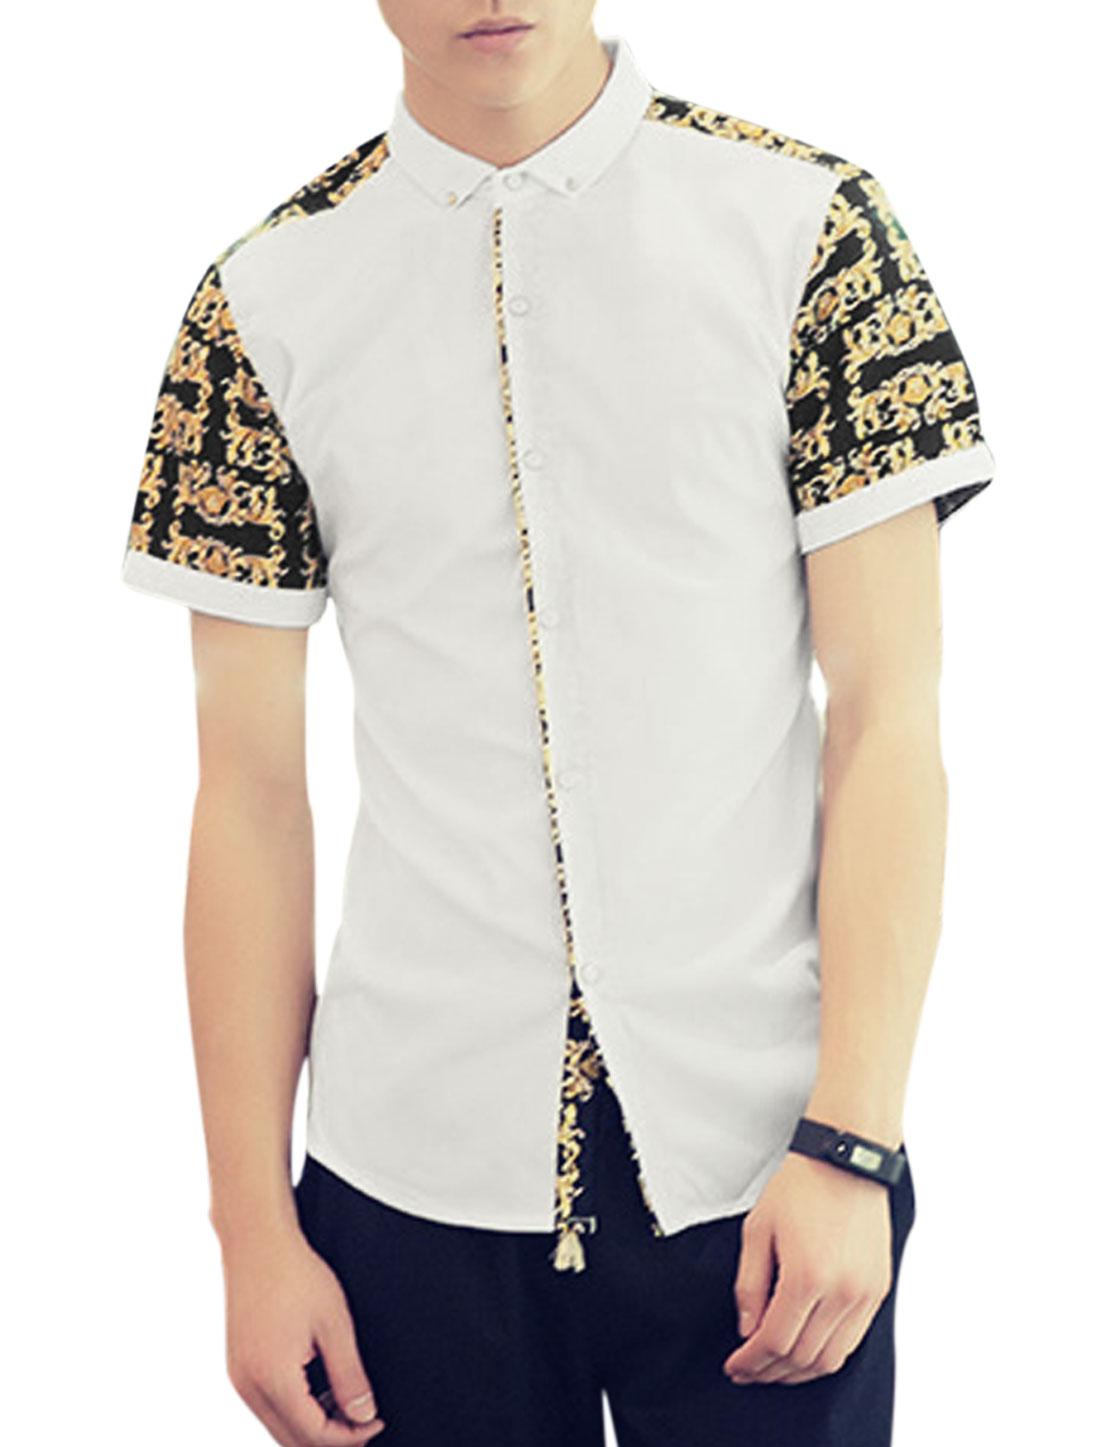 Men Short Sleeve Novelty Print Button Up Leisure Shirts White S